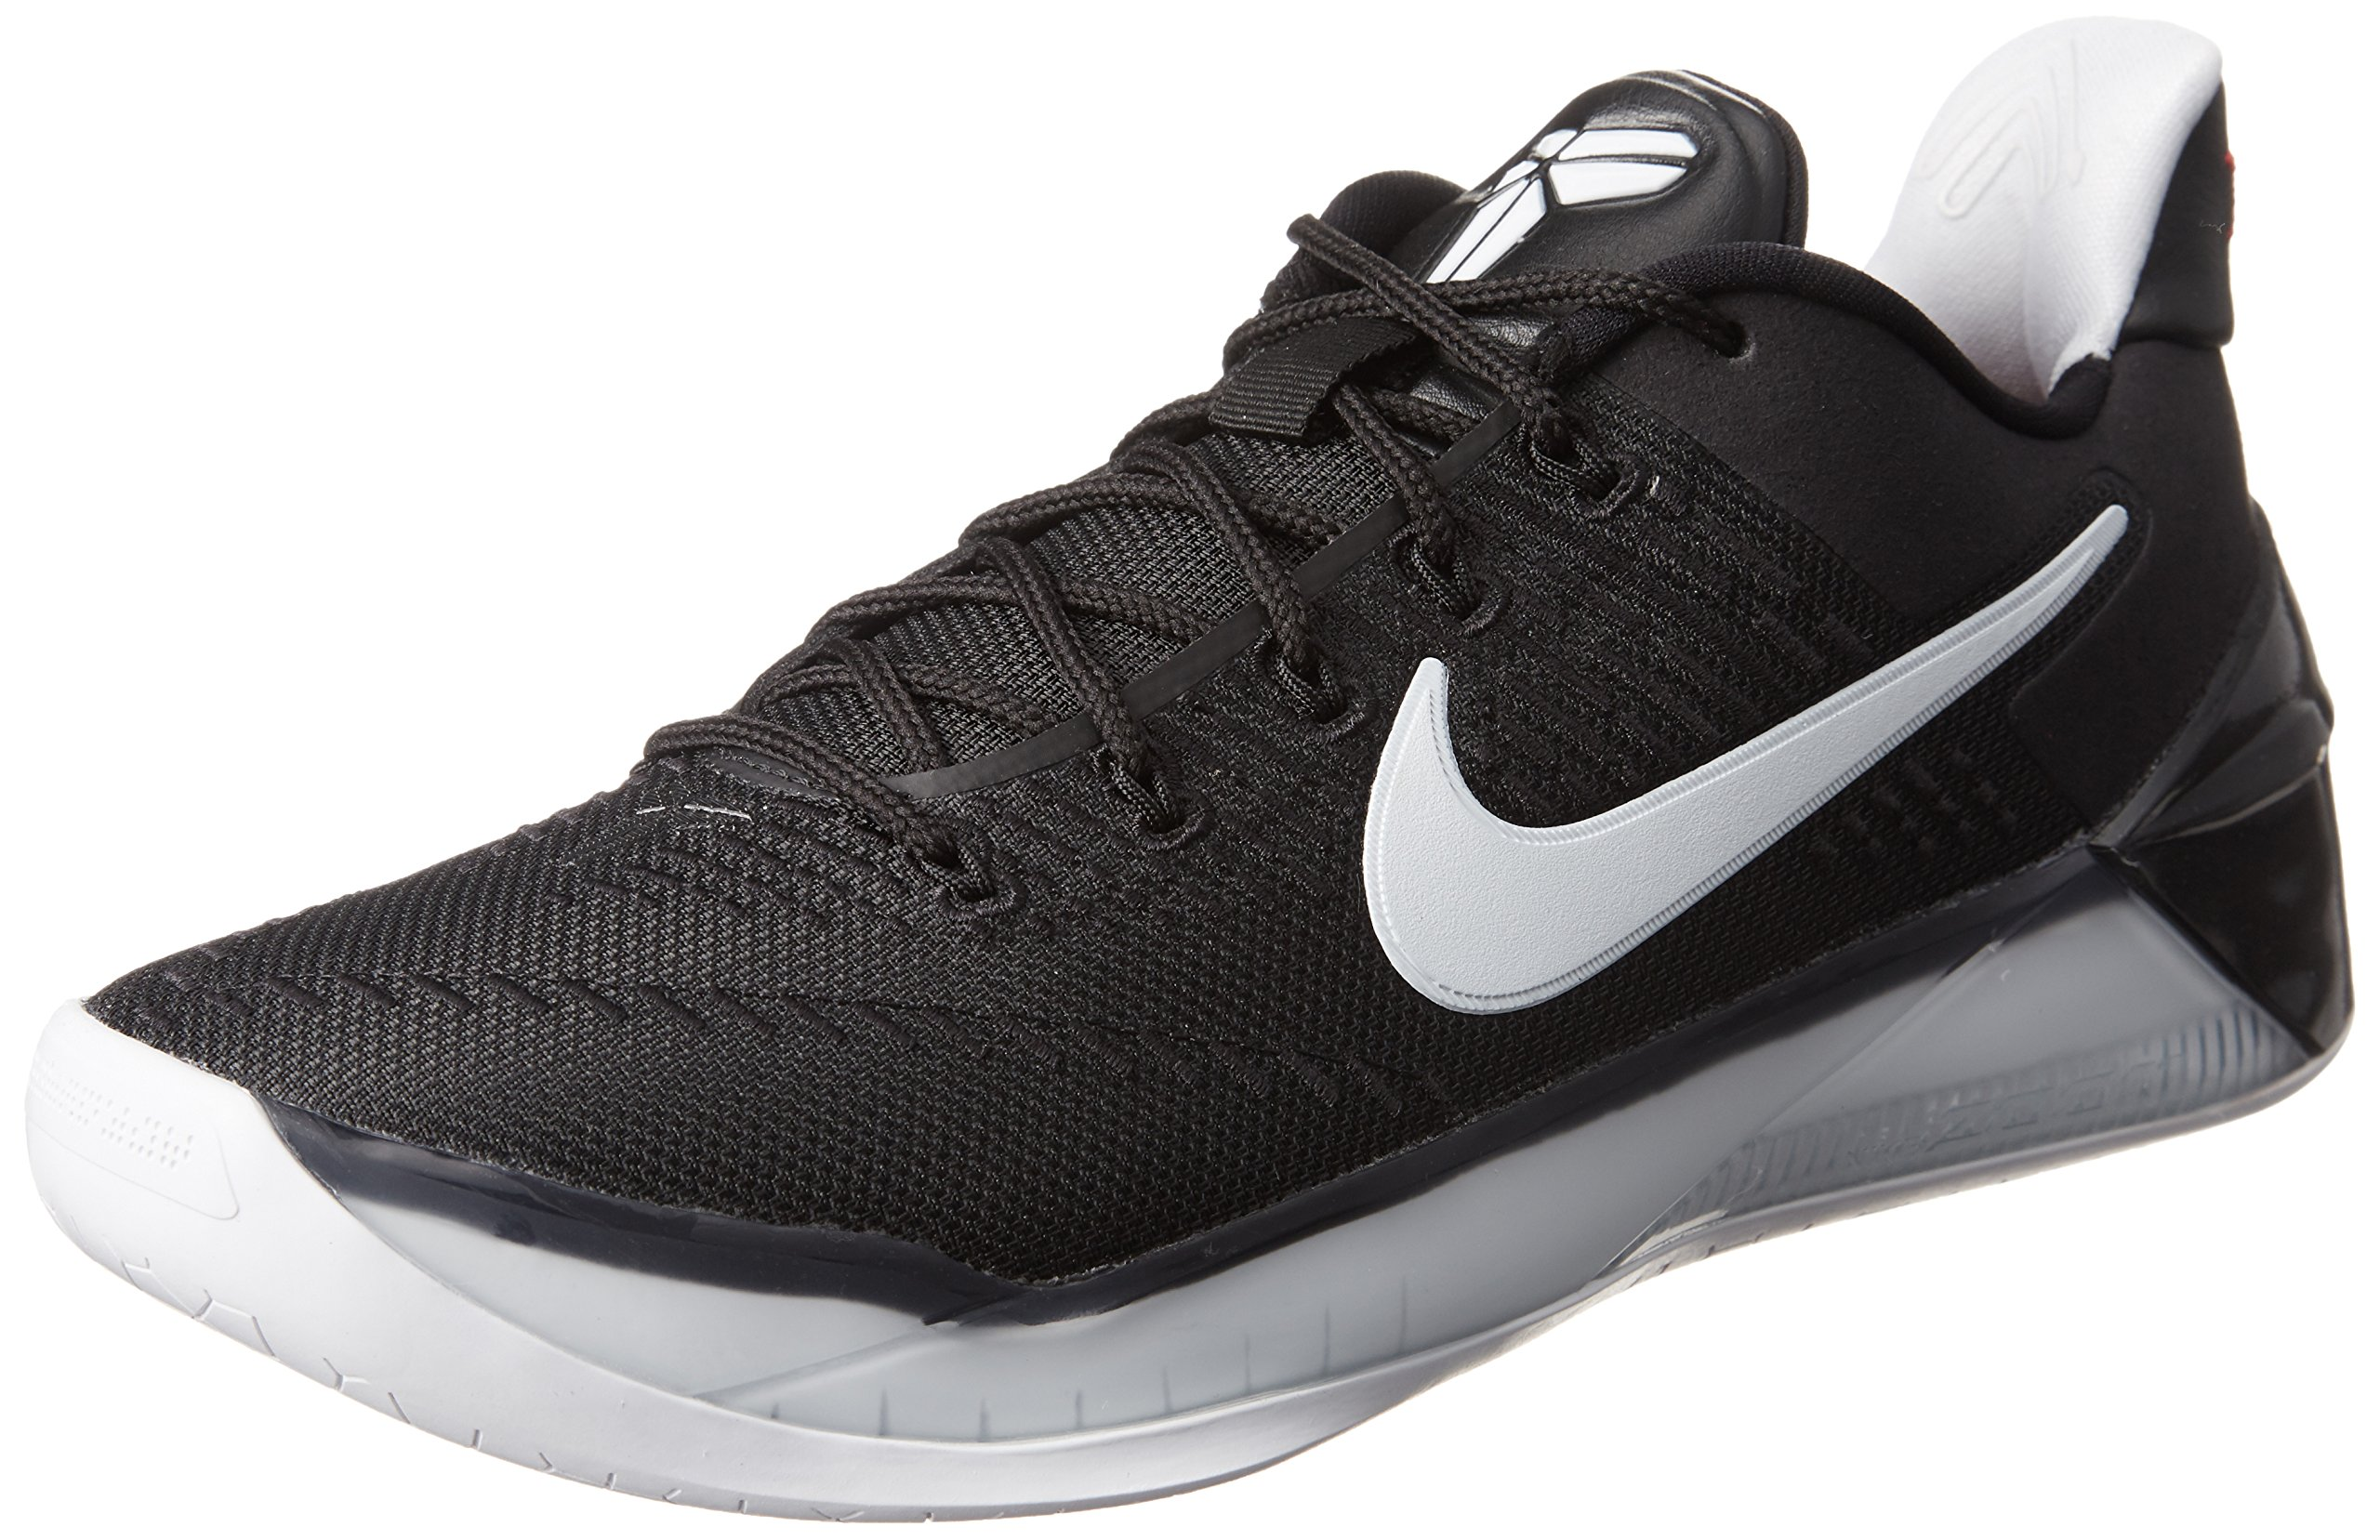 deb070e75ca2 Galleon - Nike Men s Kobe A.D. Basketball Shoes (9